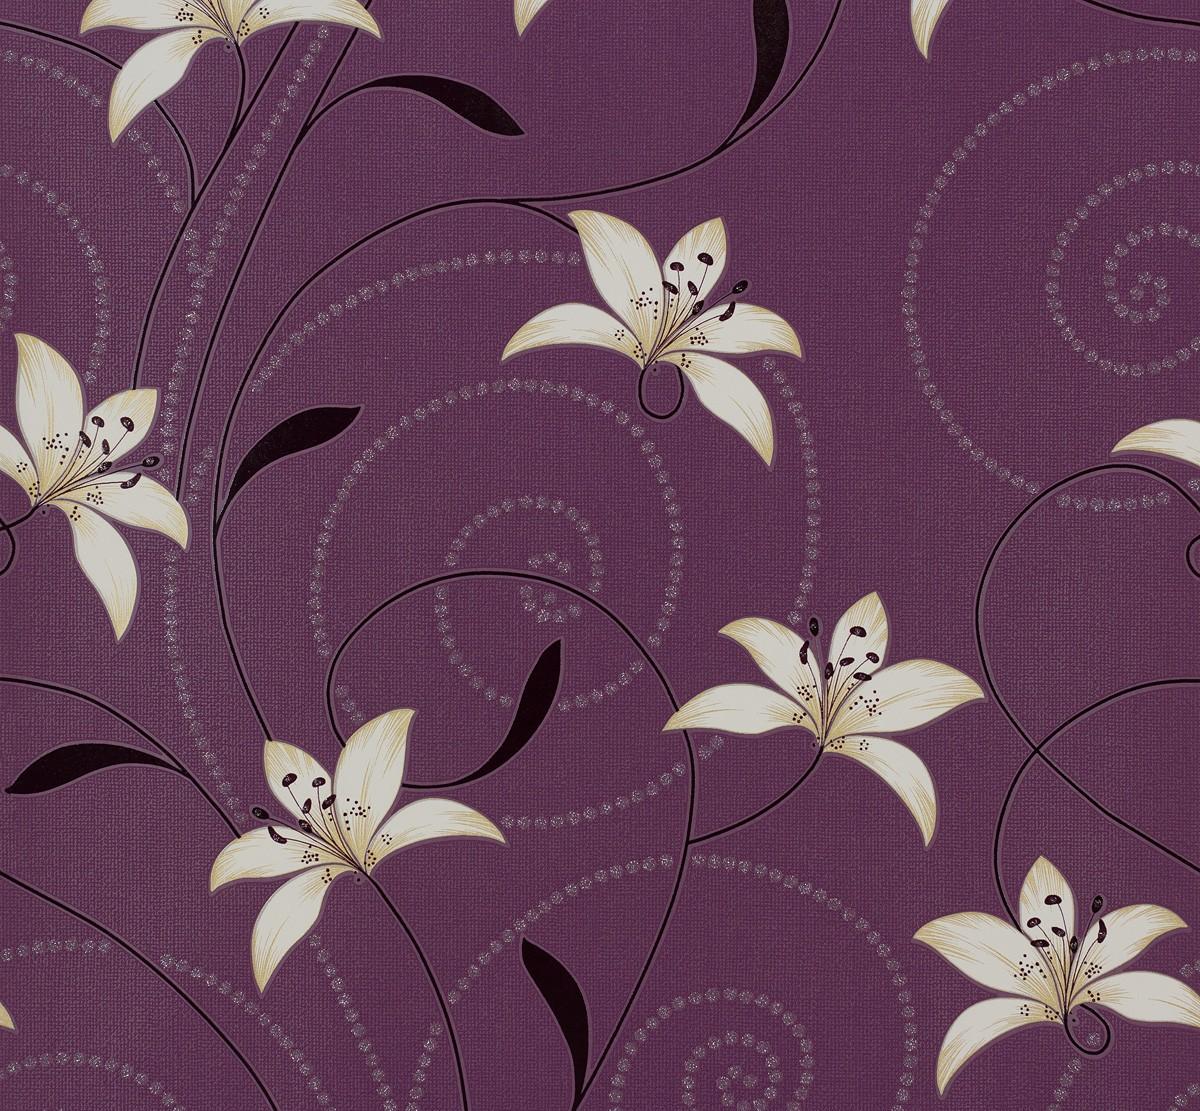 tapete blumen lila creme tapeten livingwalls atlanta 95700 5 957005 2 50 1qm ebay. Black Bedroom Furniture Sets. Home Design Ideas